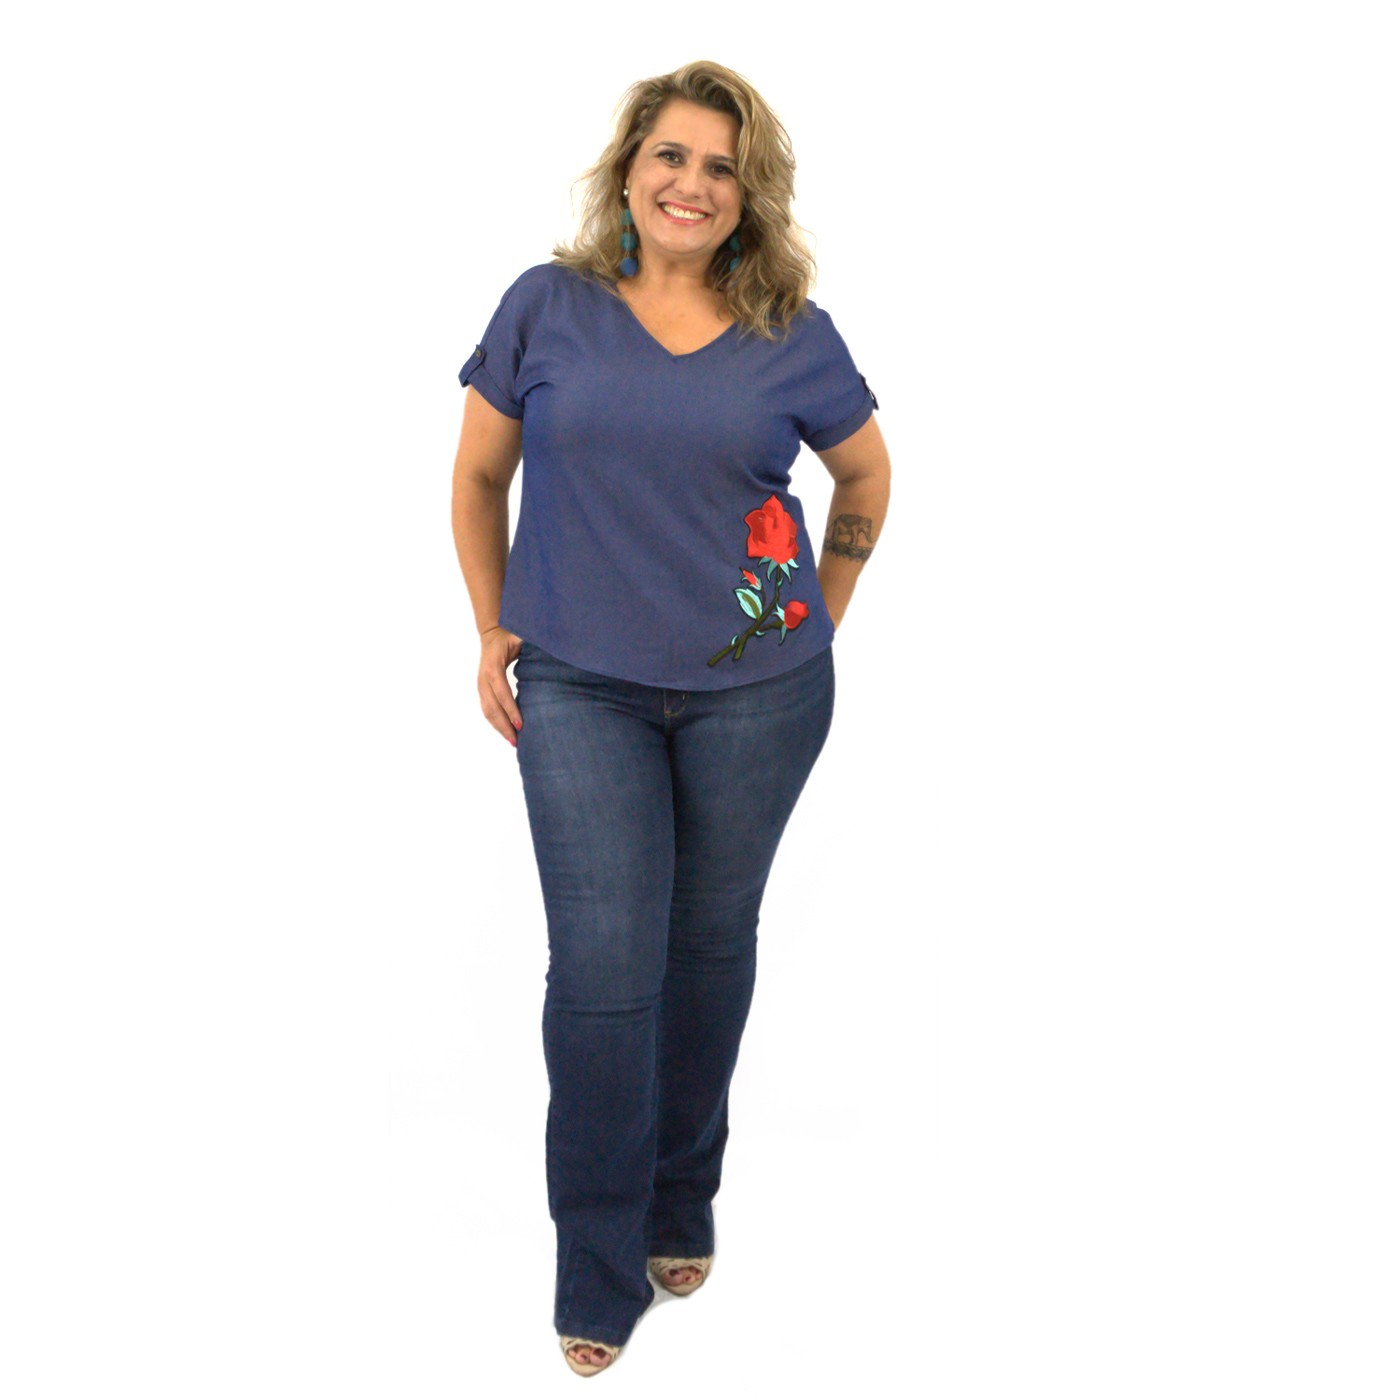 Blusinha Plus Size Manga Curta em Jeans